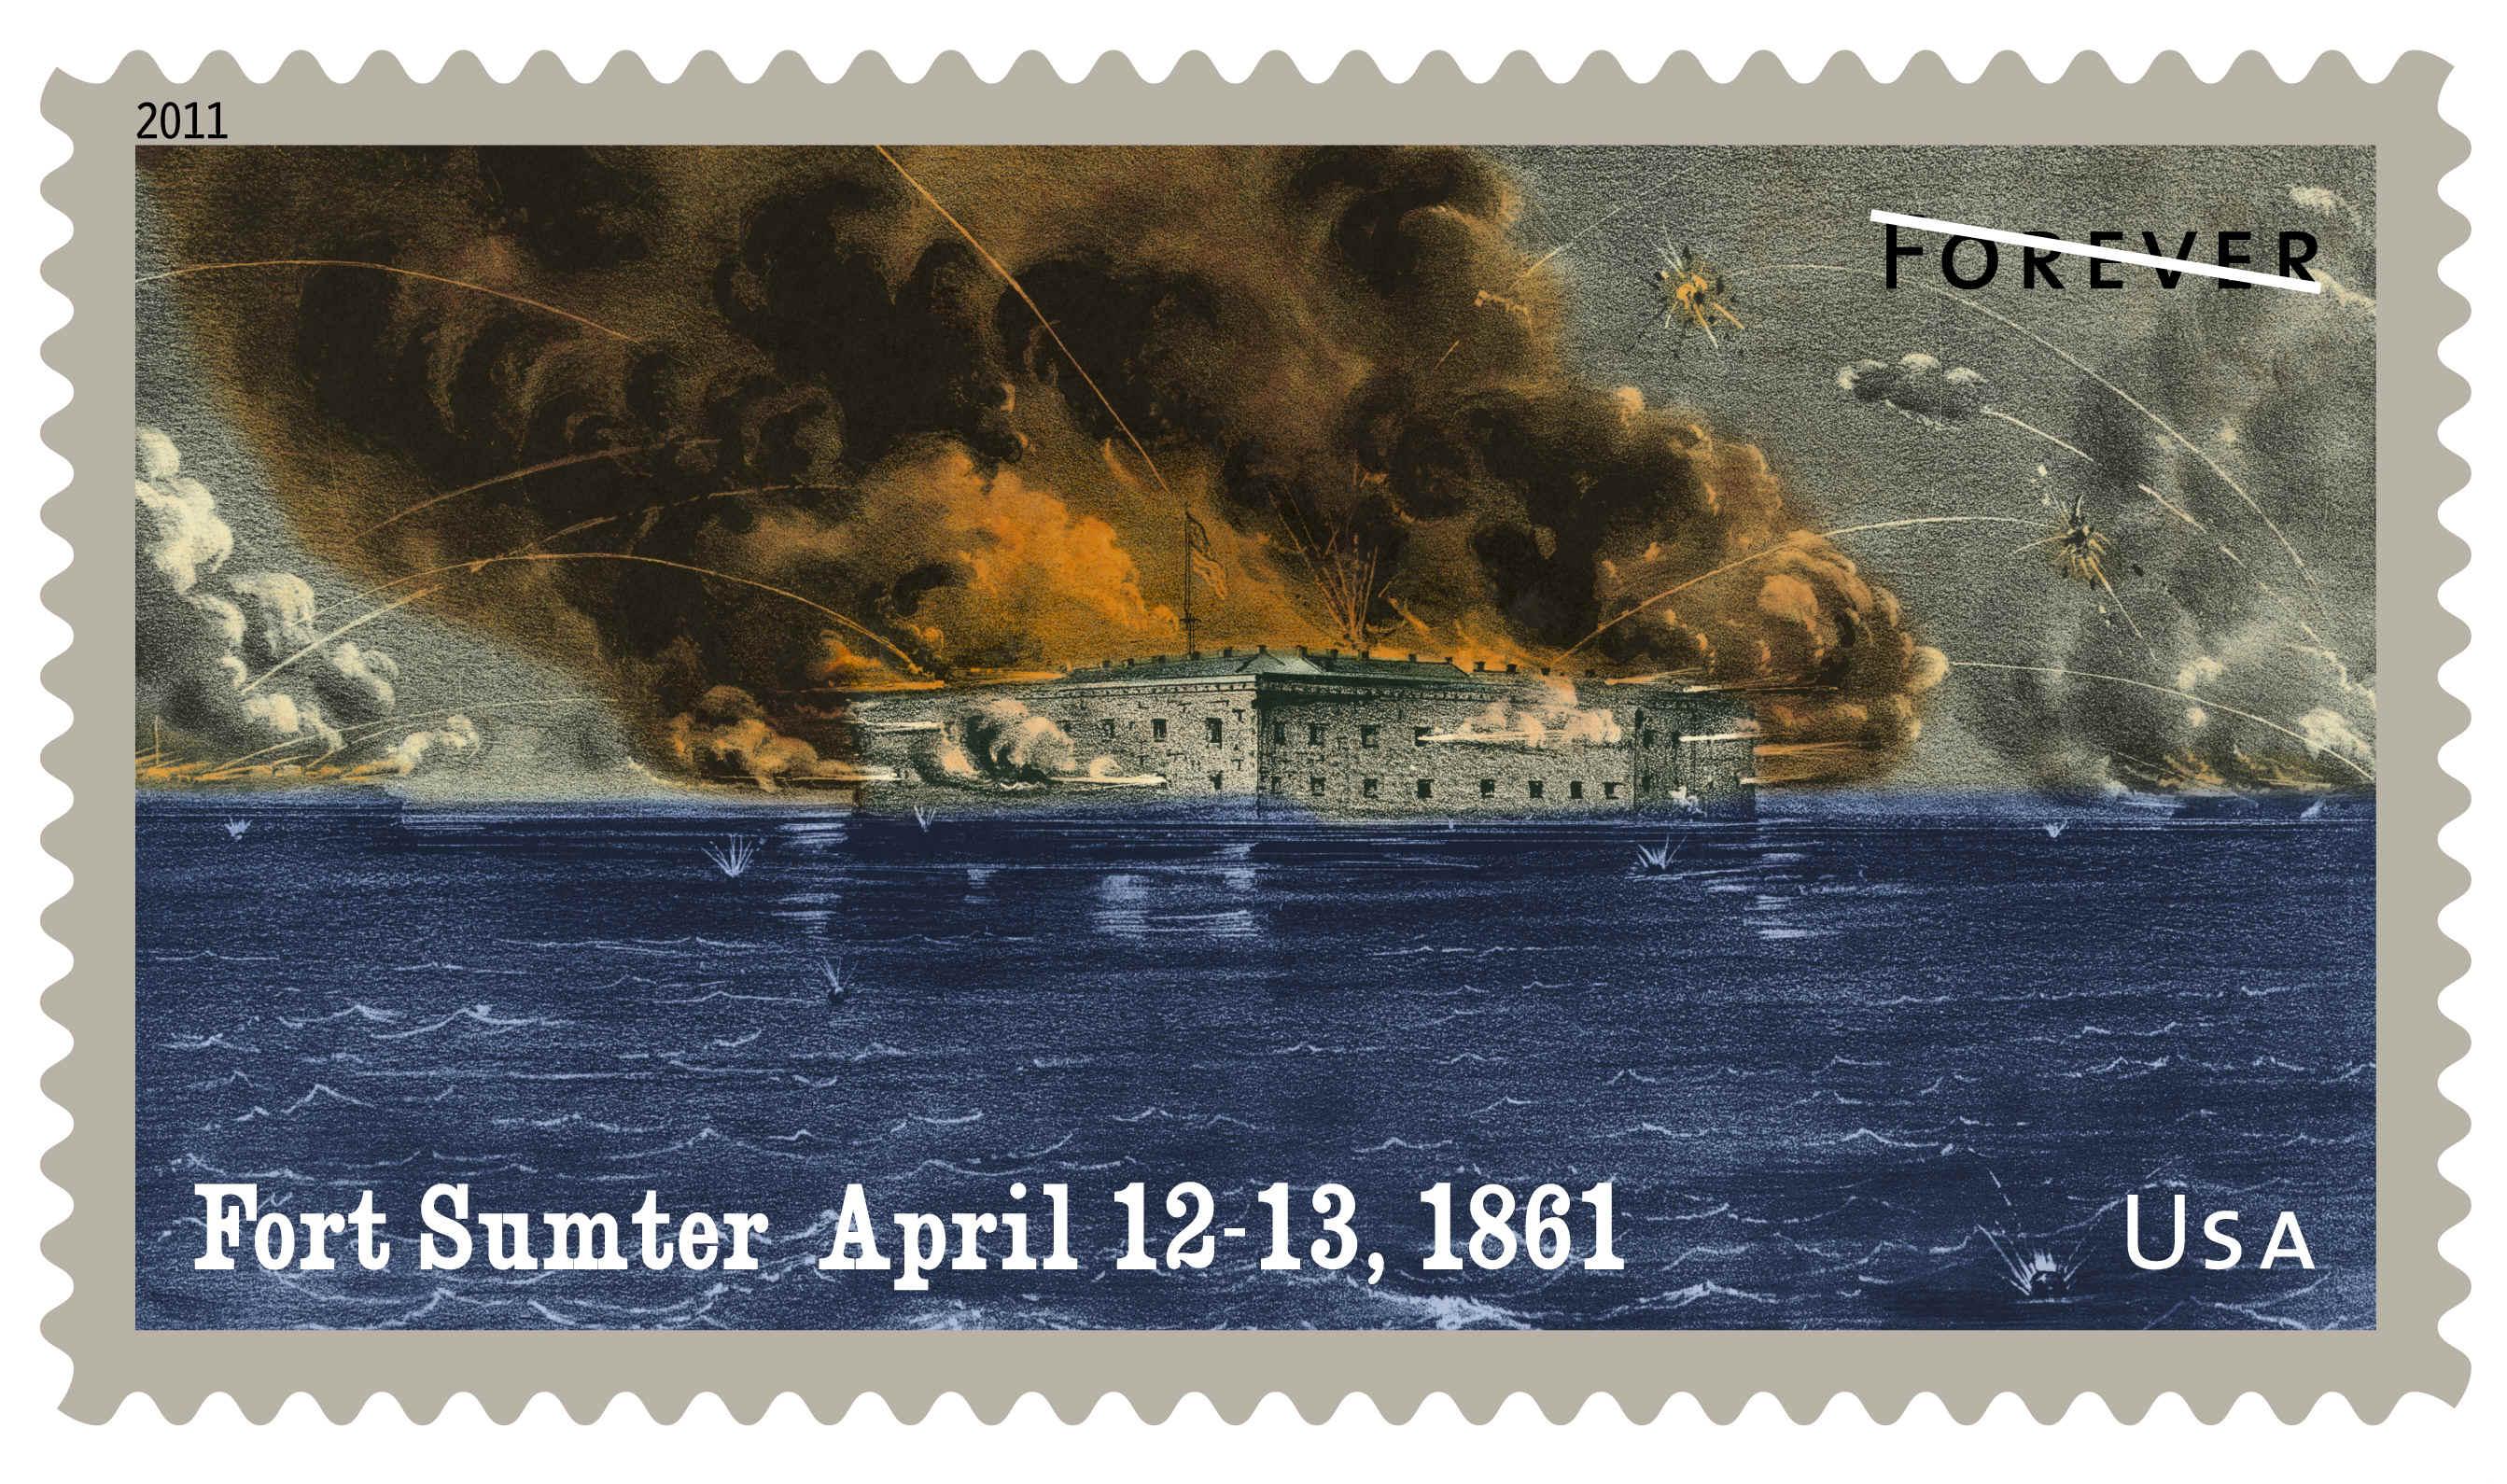 Fort Sumter.jpg (2274369 bytes)